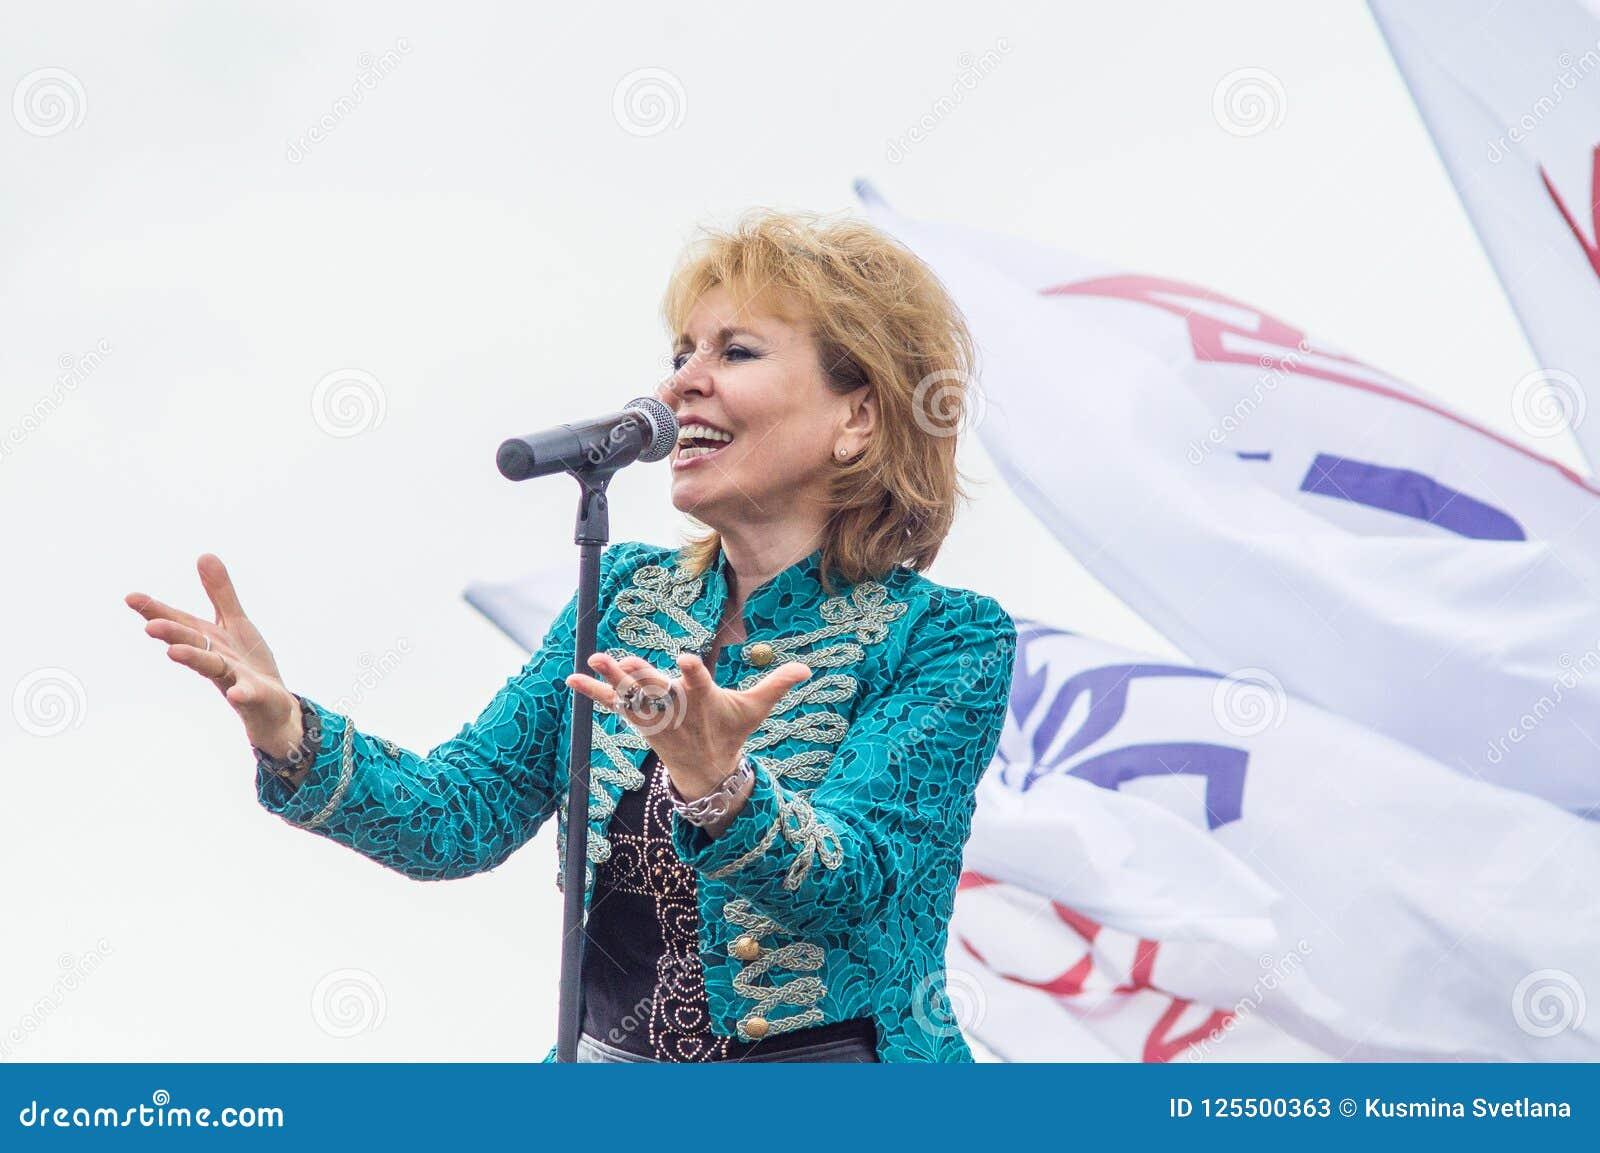 Russian Singer Olga Kormukhina During A Concert In The Kaluga Region